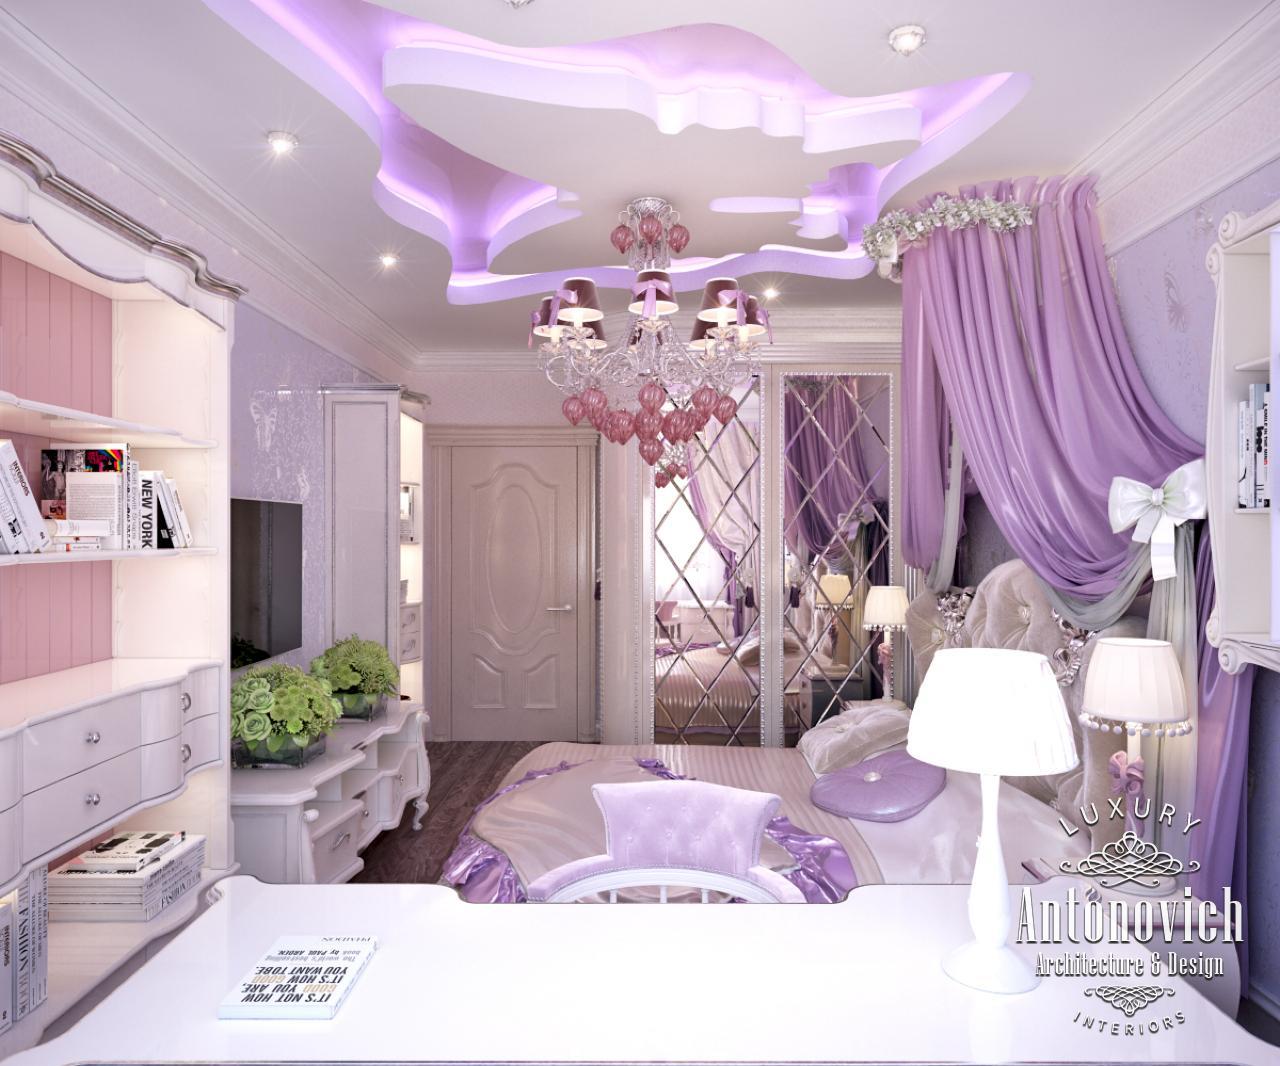 pink girly bedroom from katrina antonovich by luxury antonovich design architizer